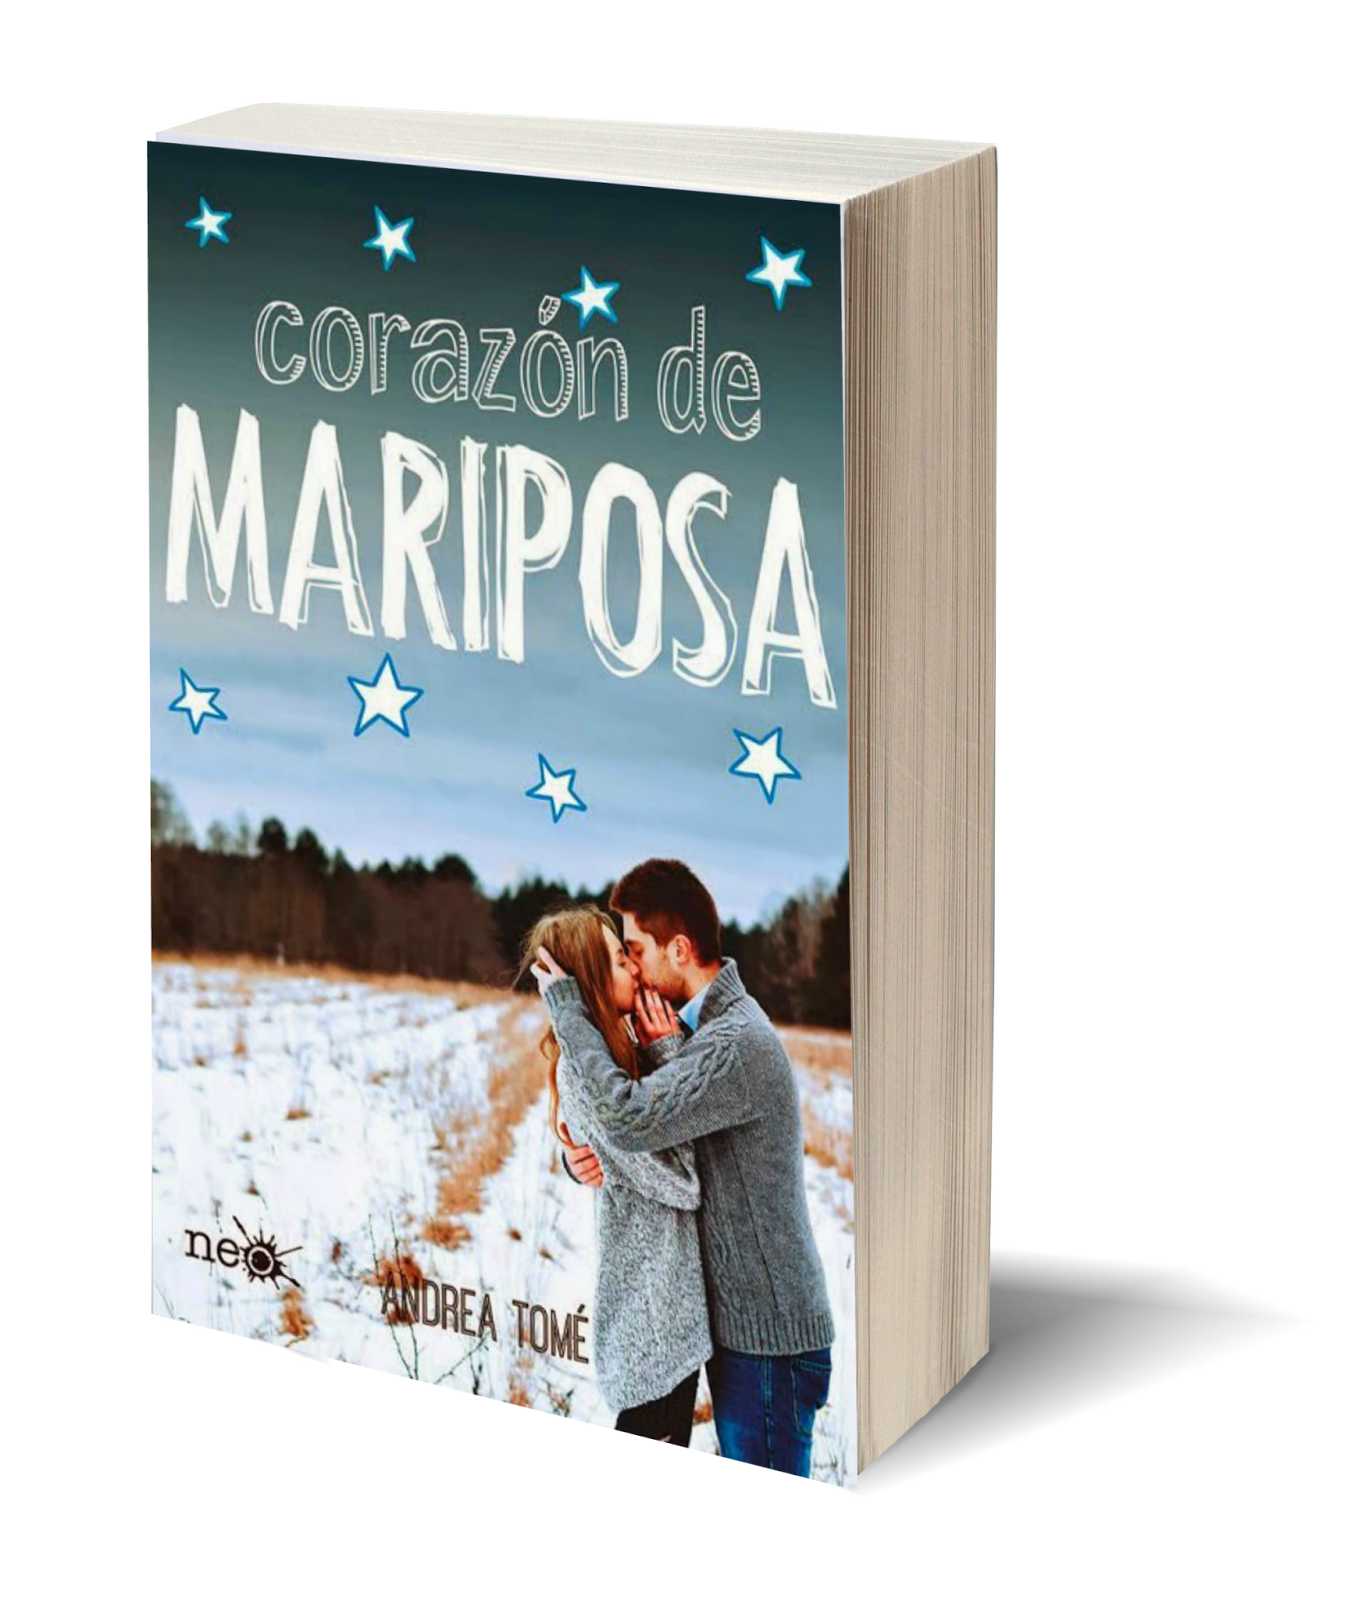 Corazón de mariposa.my favorite books